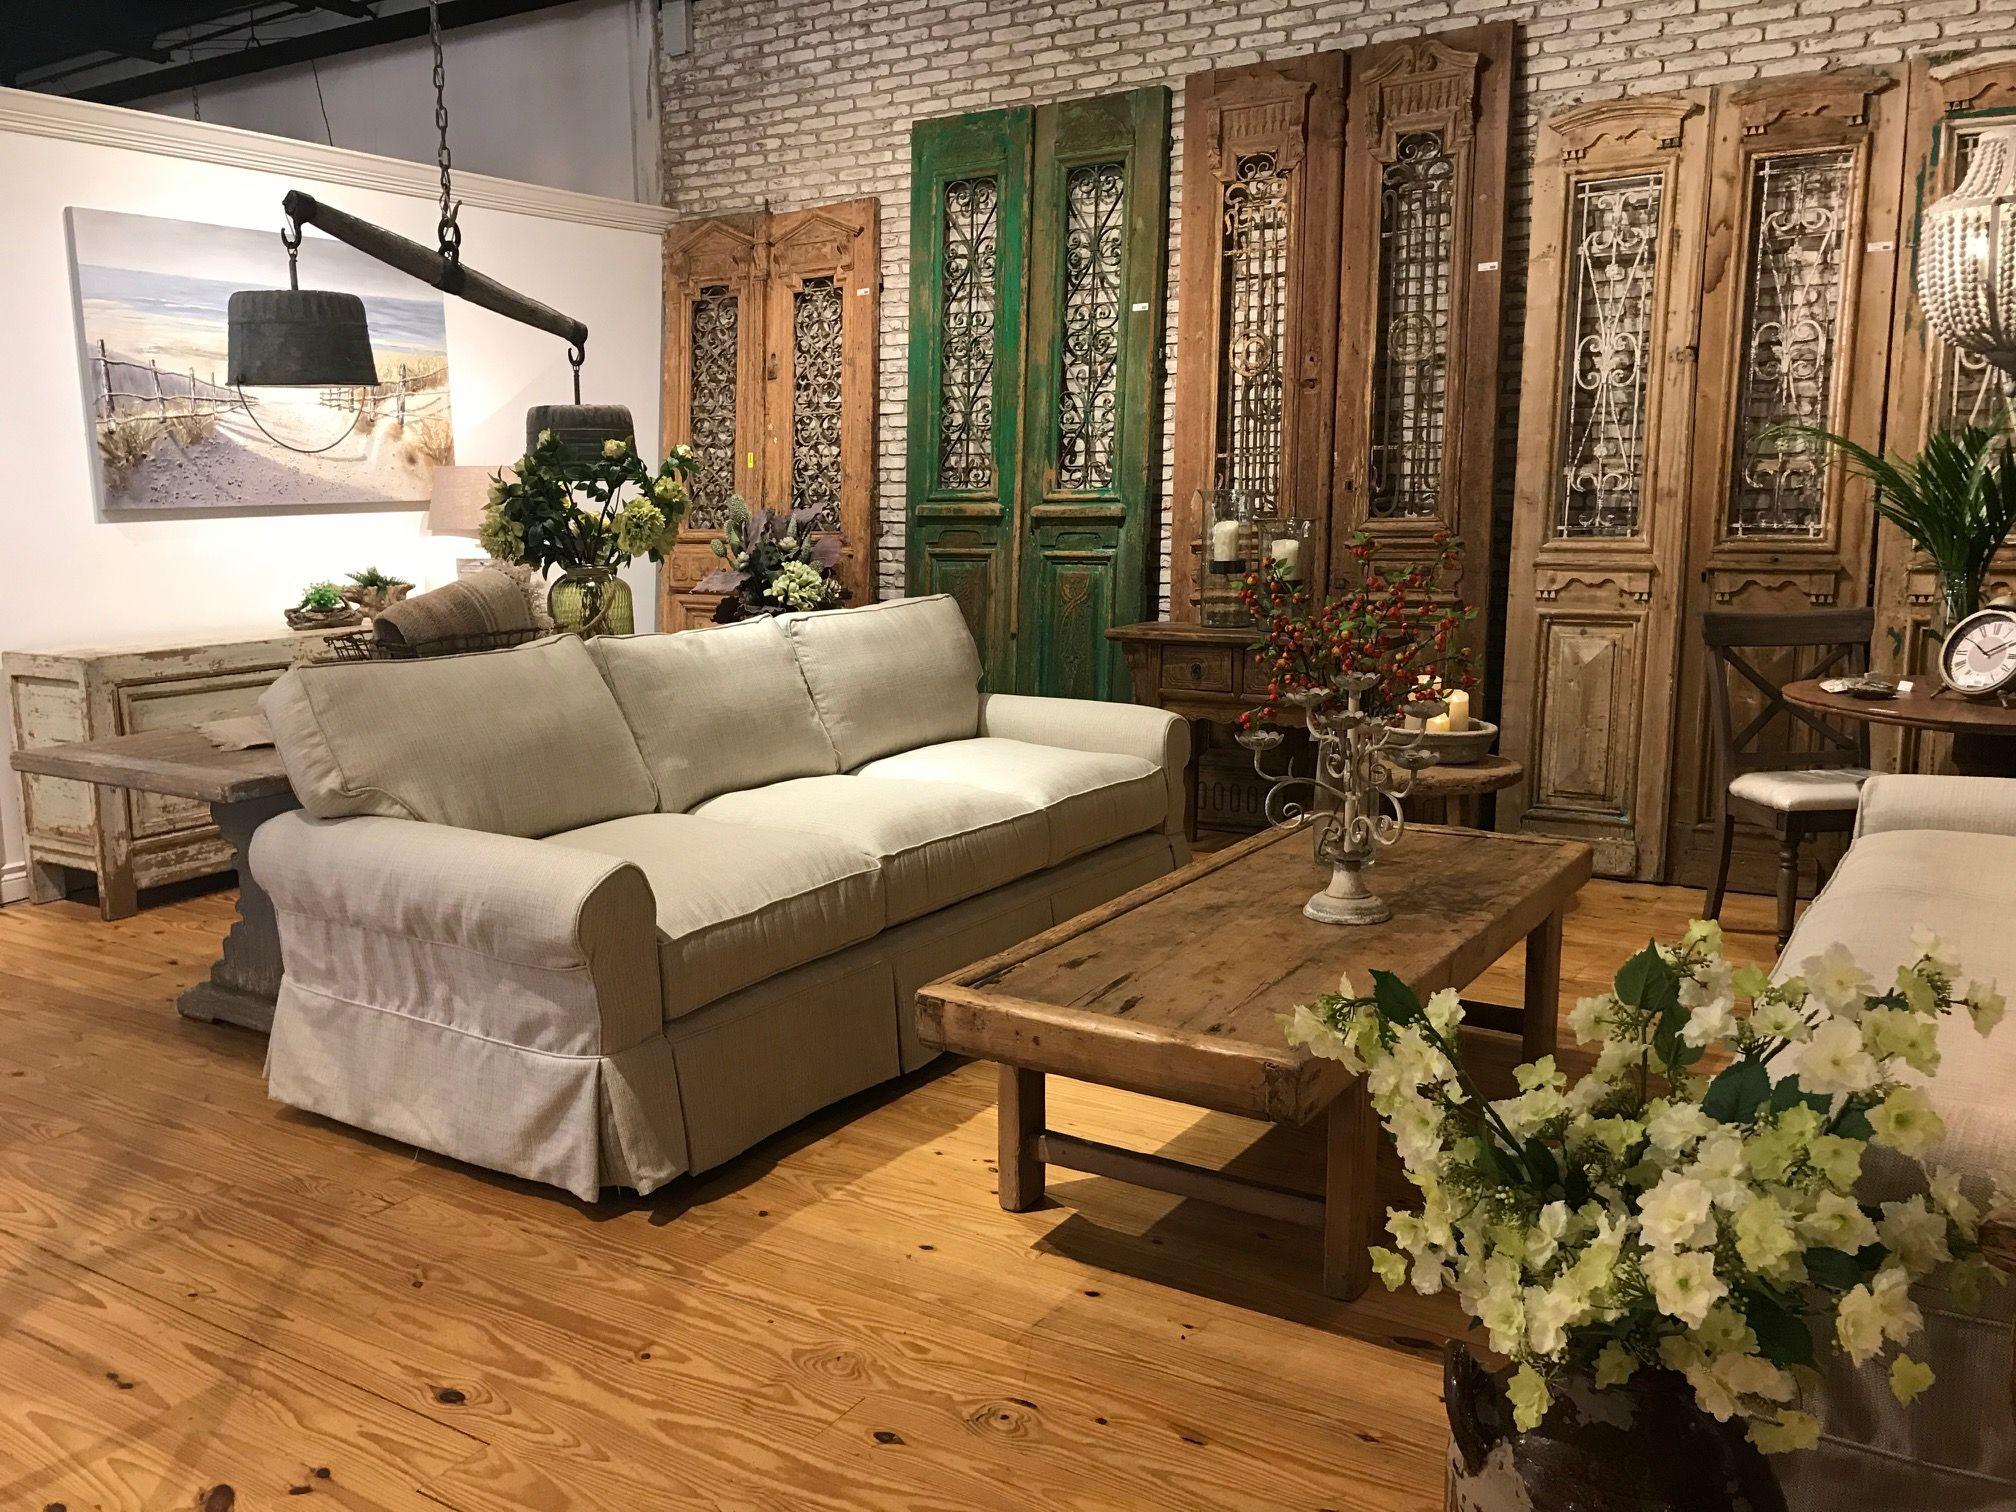 93c472cf440298db489175bf33c01b46 - Best Furniture Stores Palm Beach Gardens